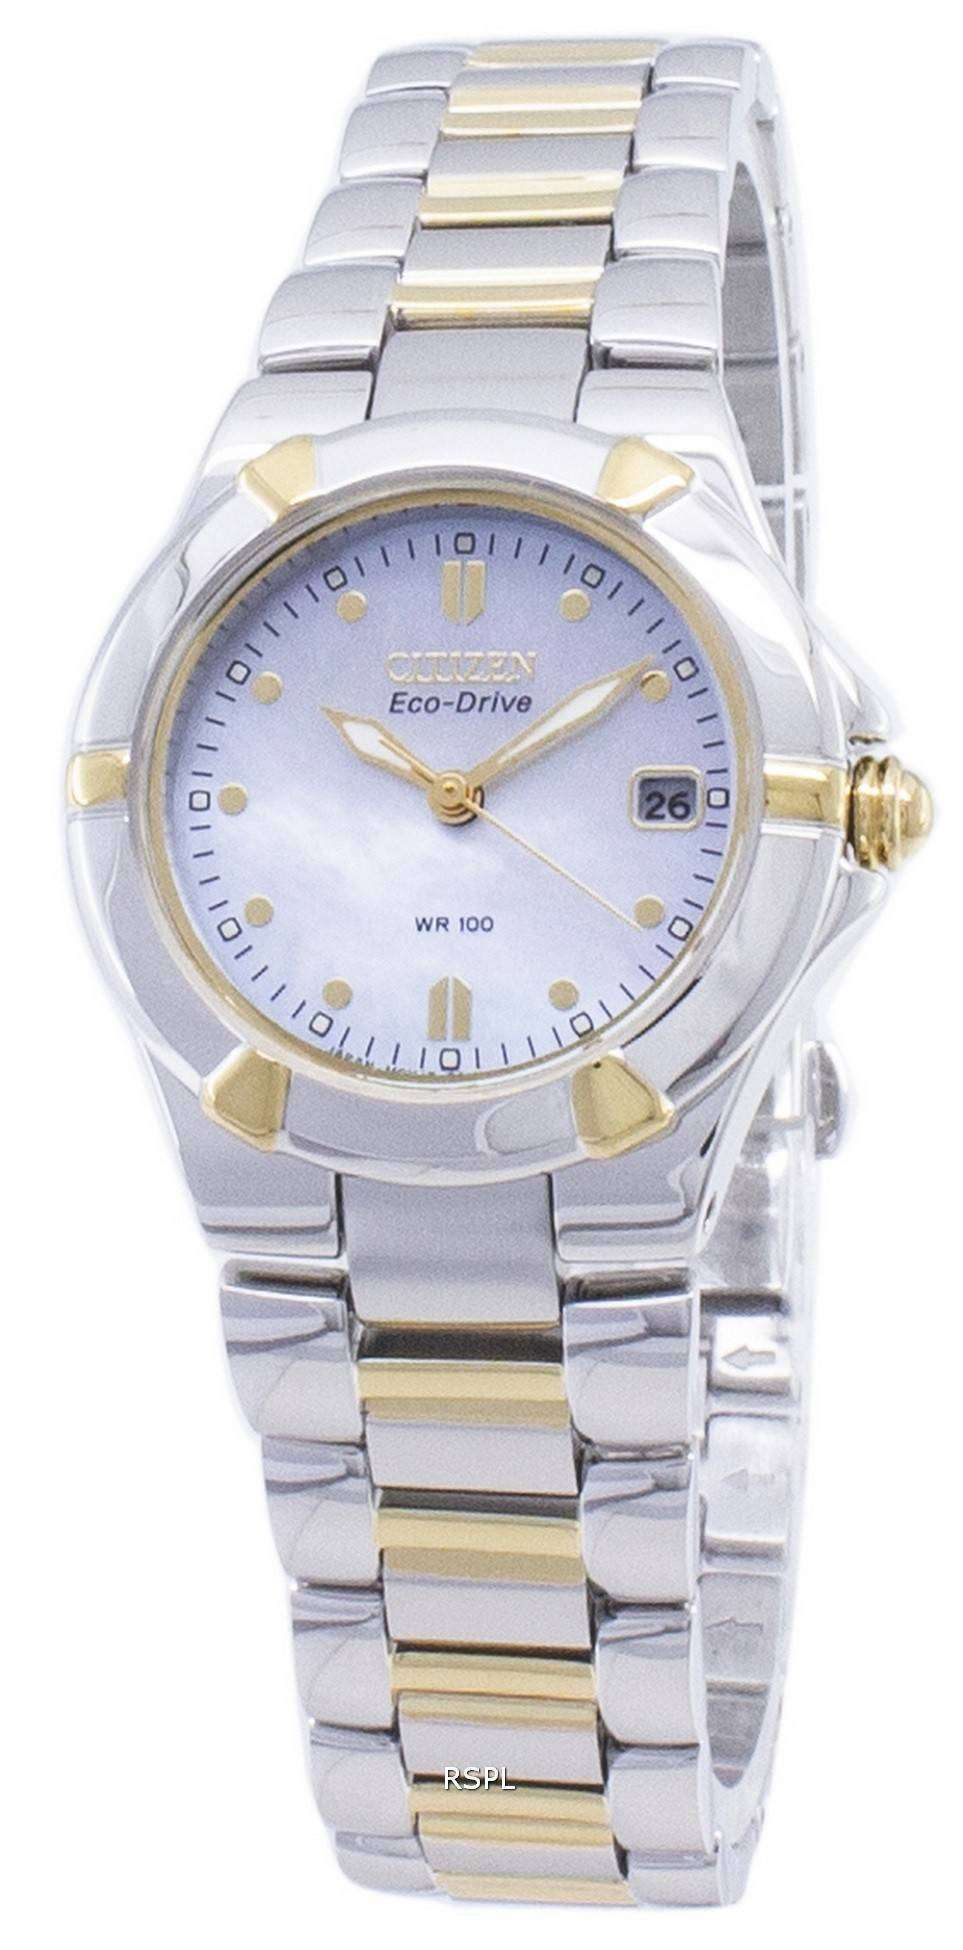 Citizen 시티즌 시계 리 바 에코 드라이브 EW1534-57D 아날로그 여성용 손목시계